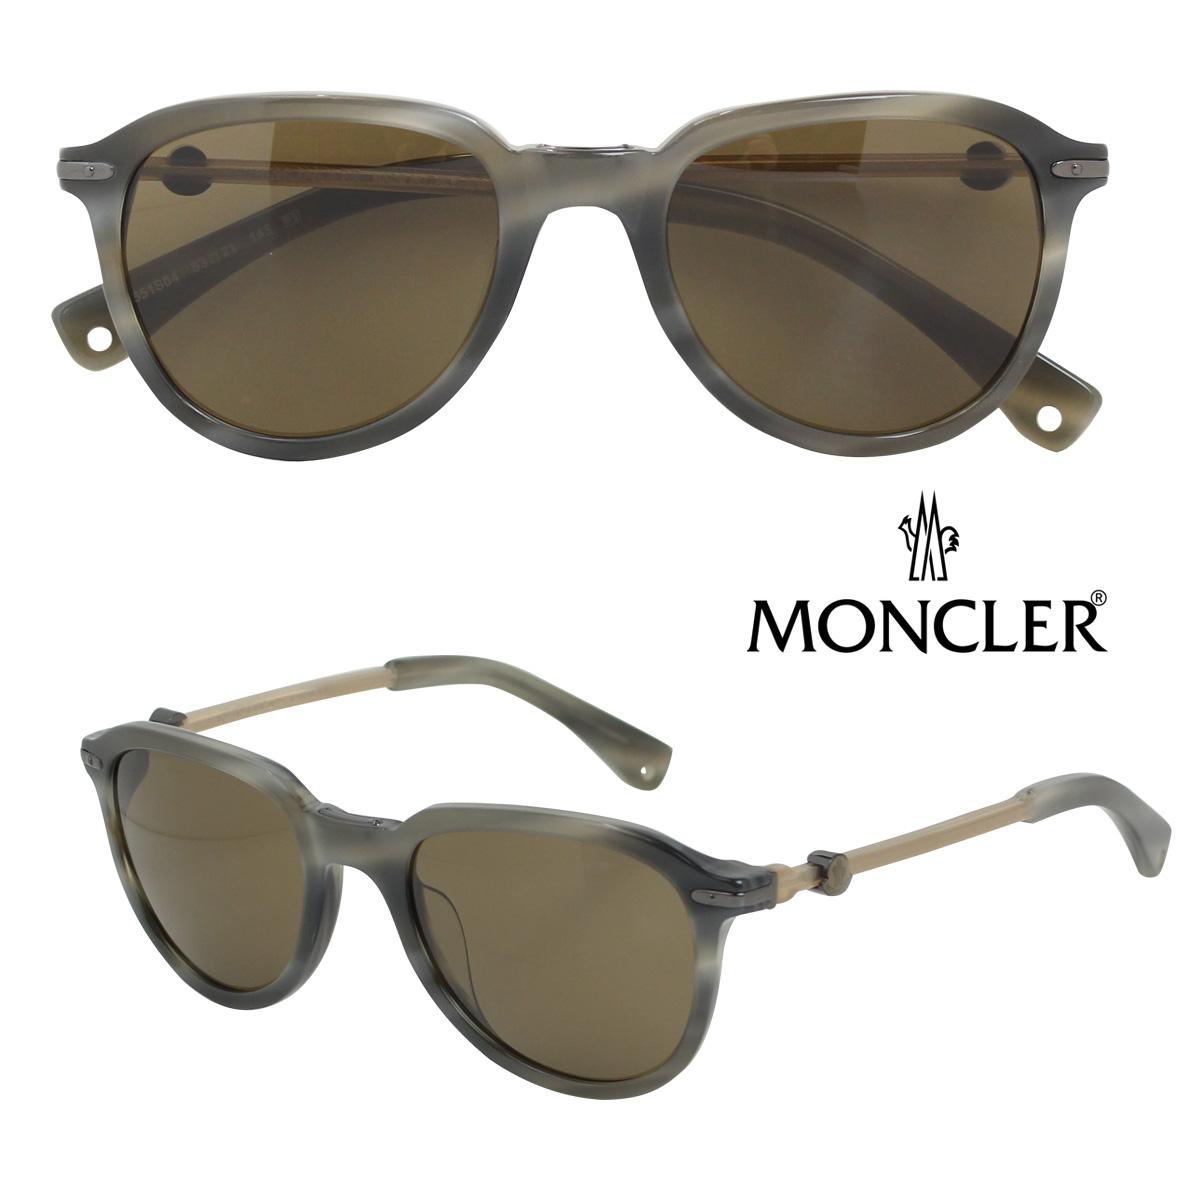 c38da3ee62 SneaK Online Shop  MONCLER MONCLER Sunglasses made in Italy men s ...